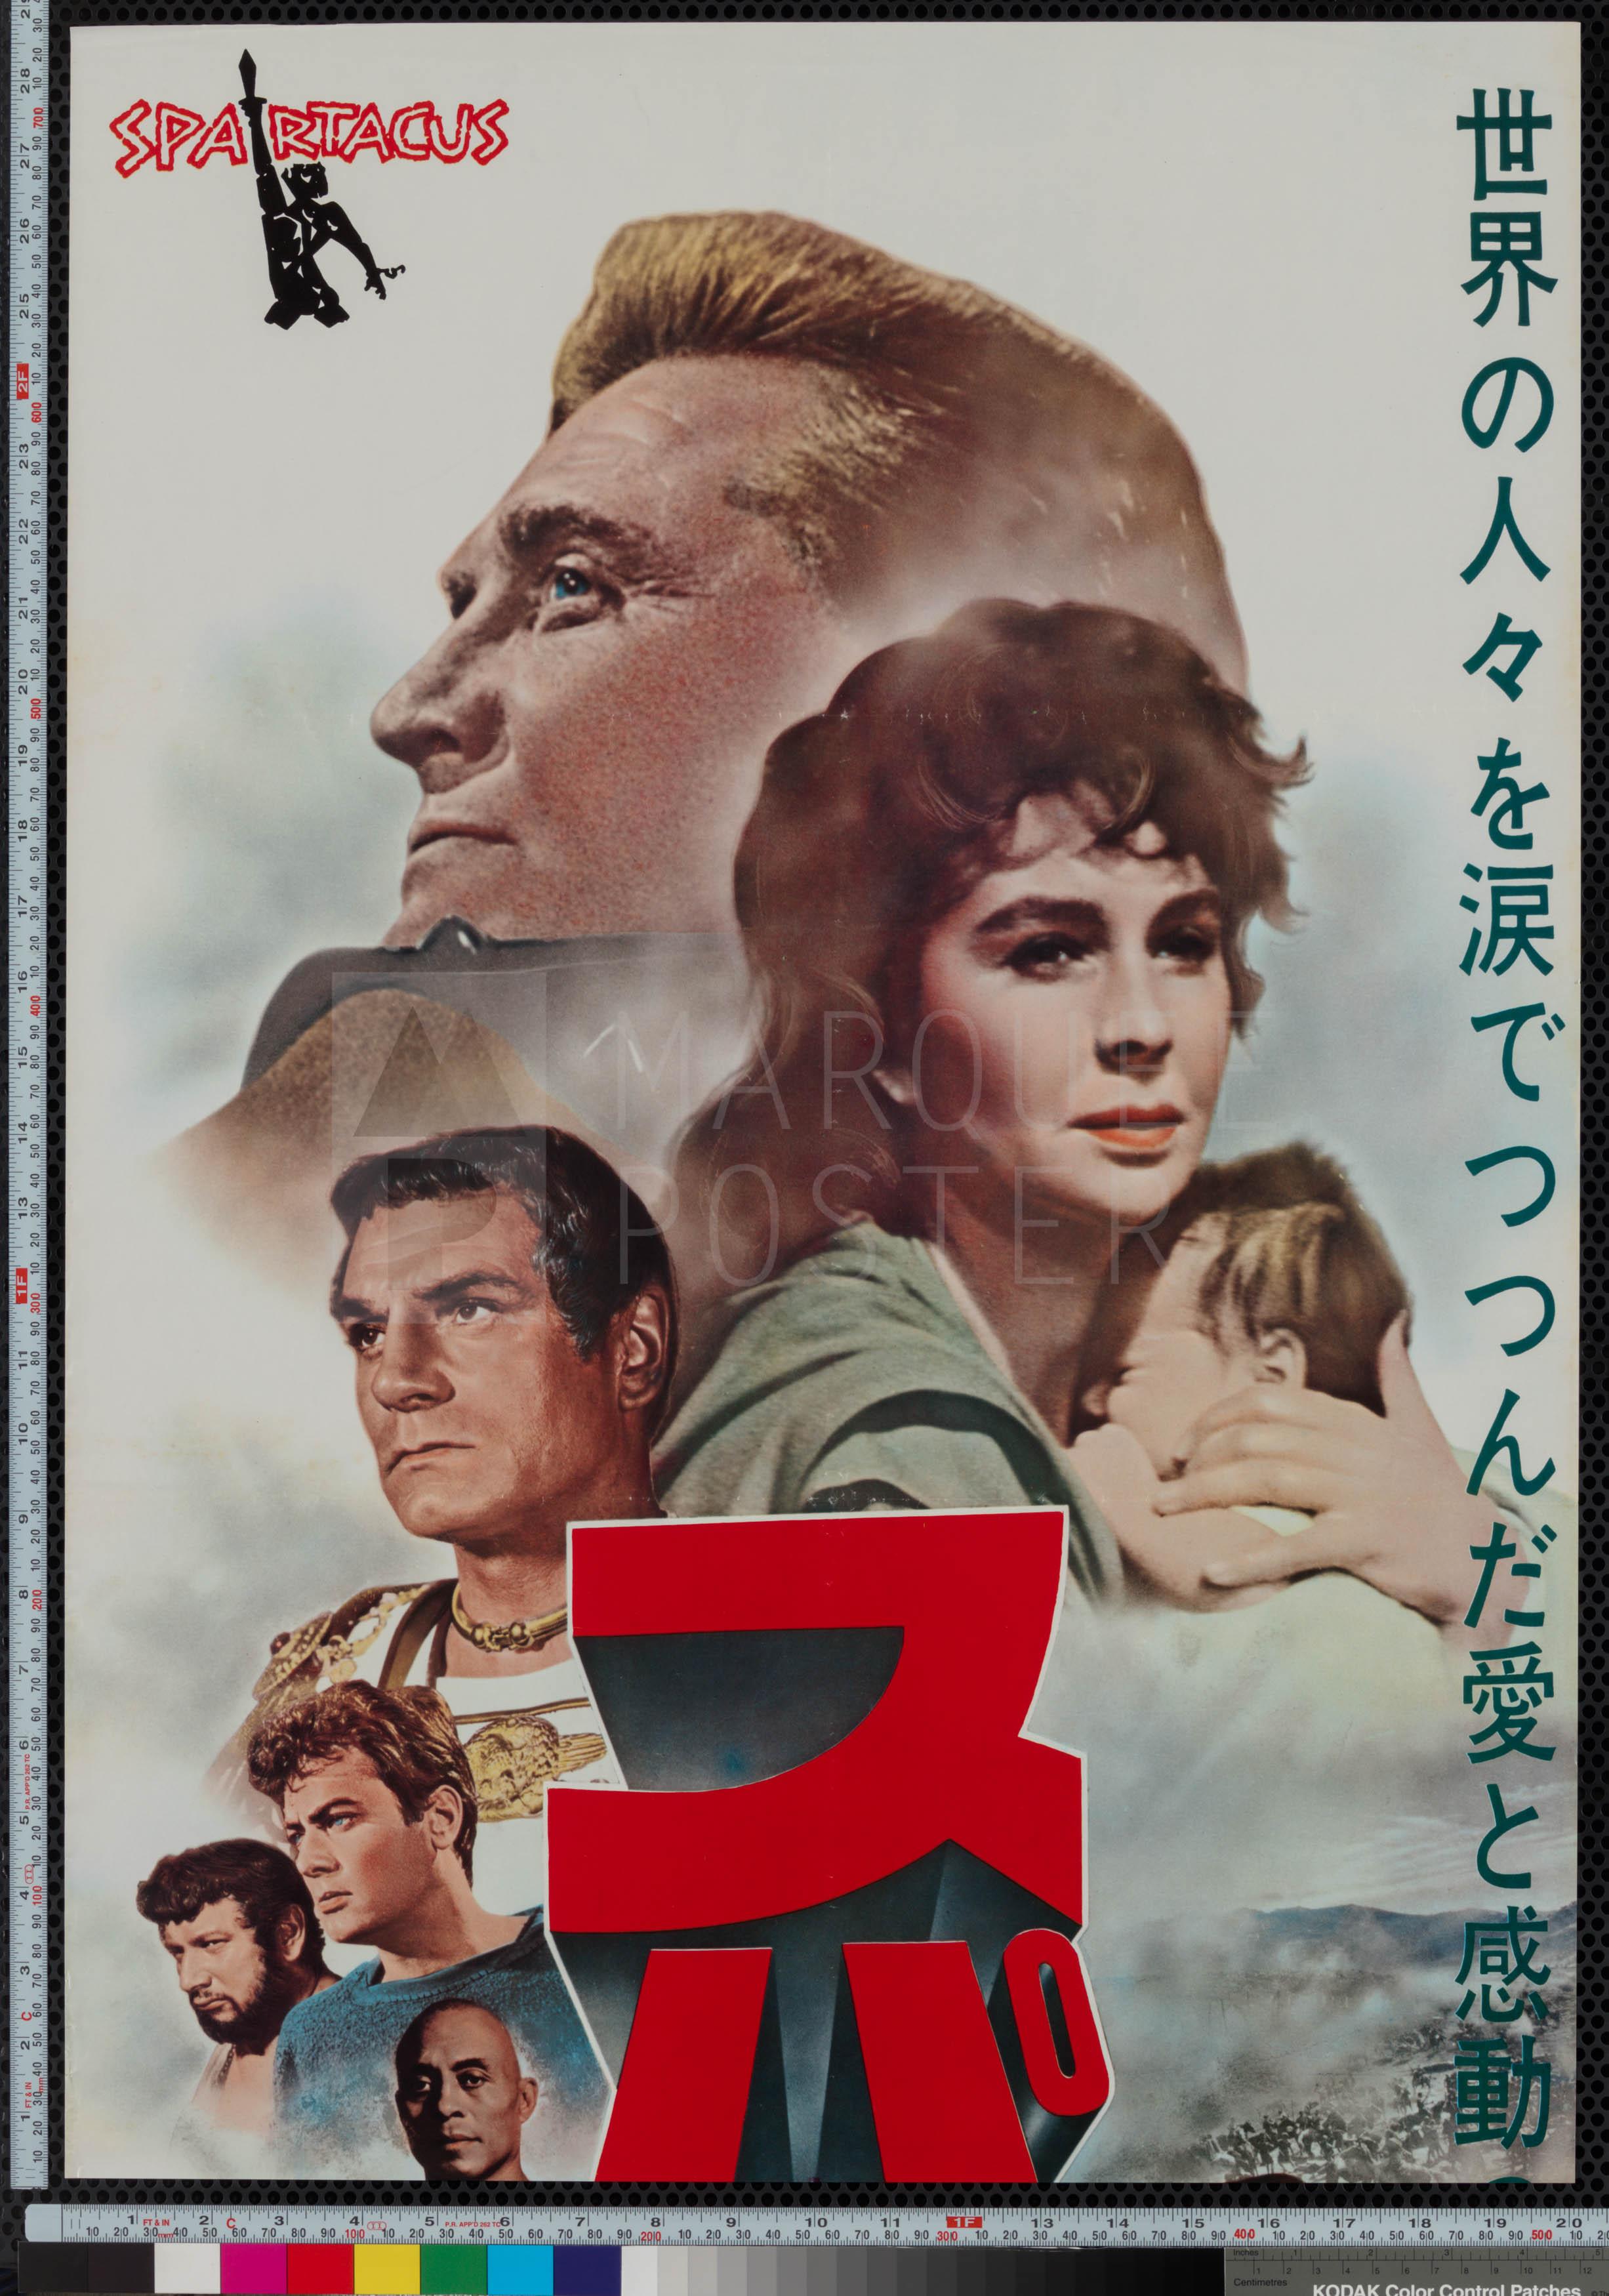 61-spartacus-japanese-stb-1960-02